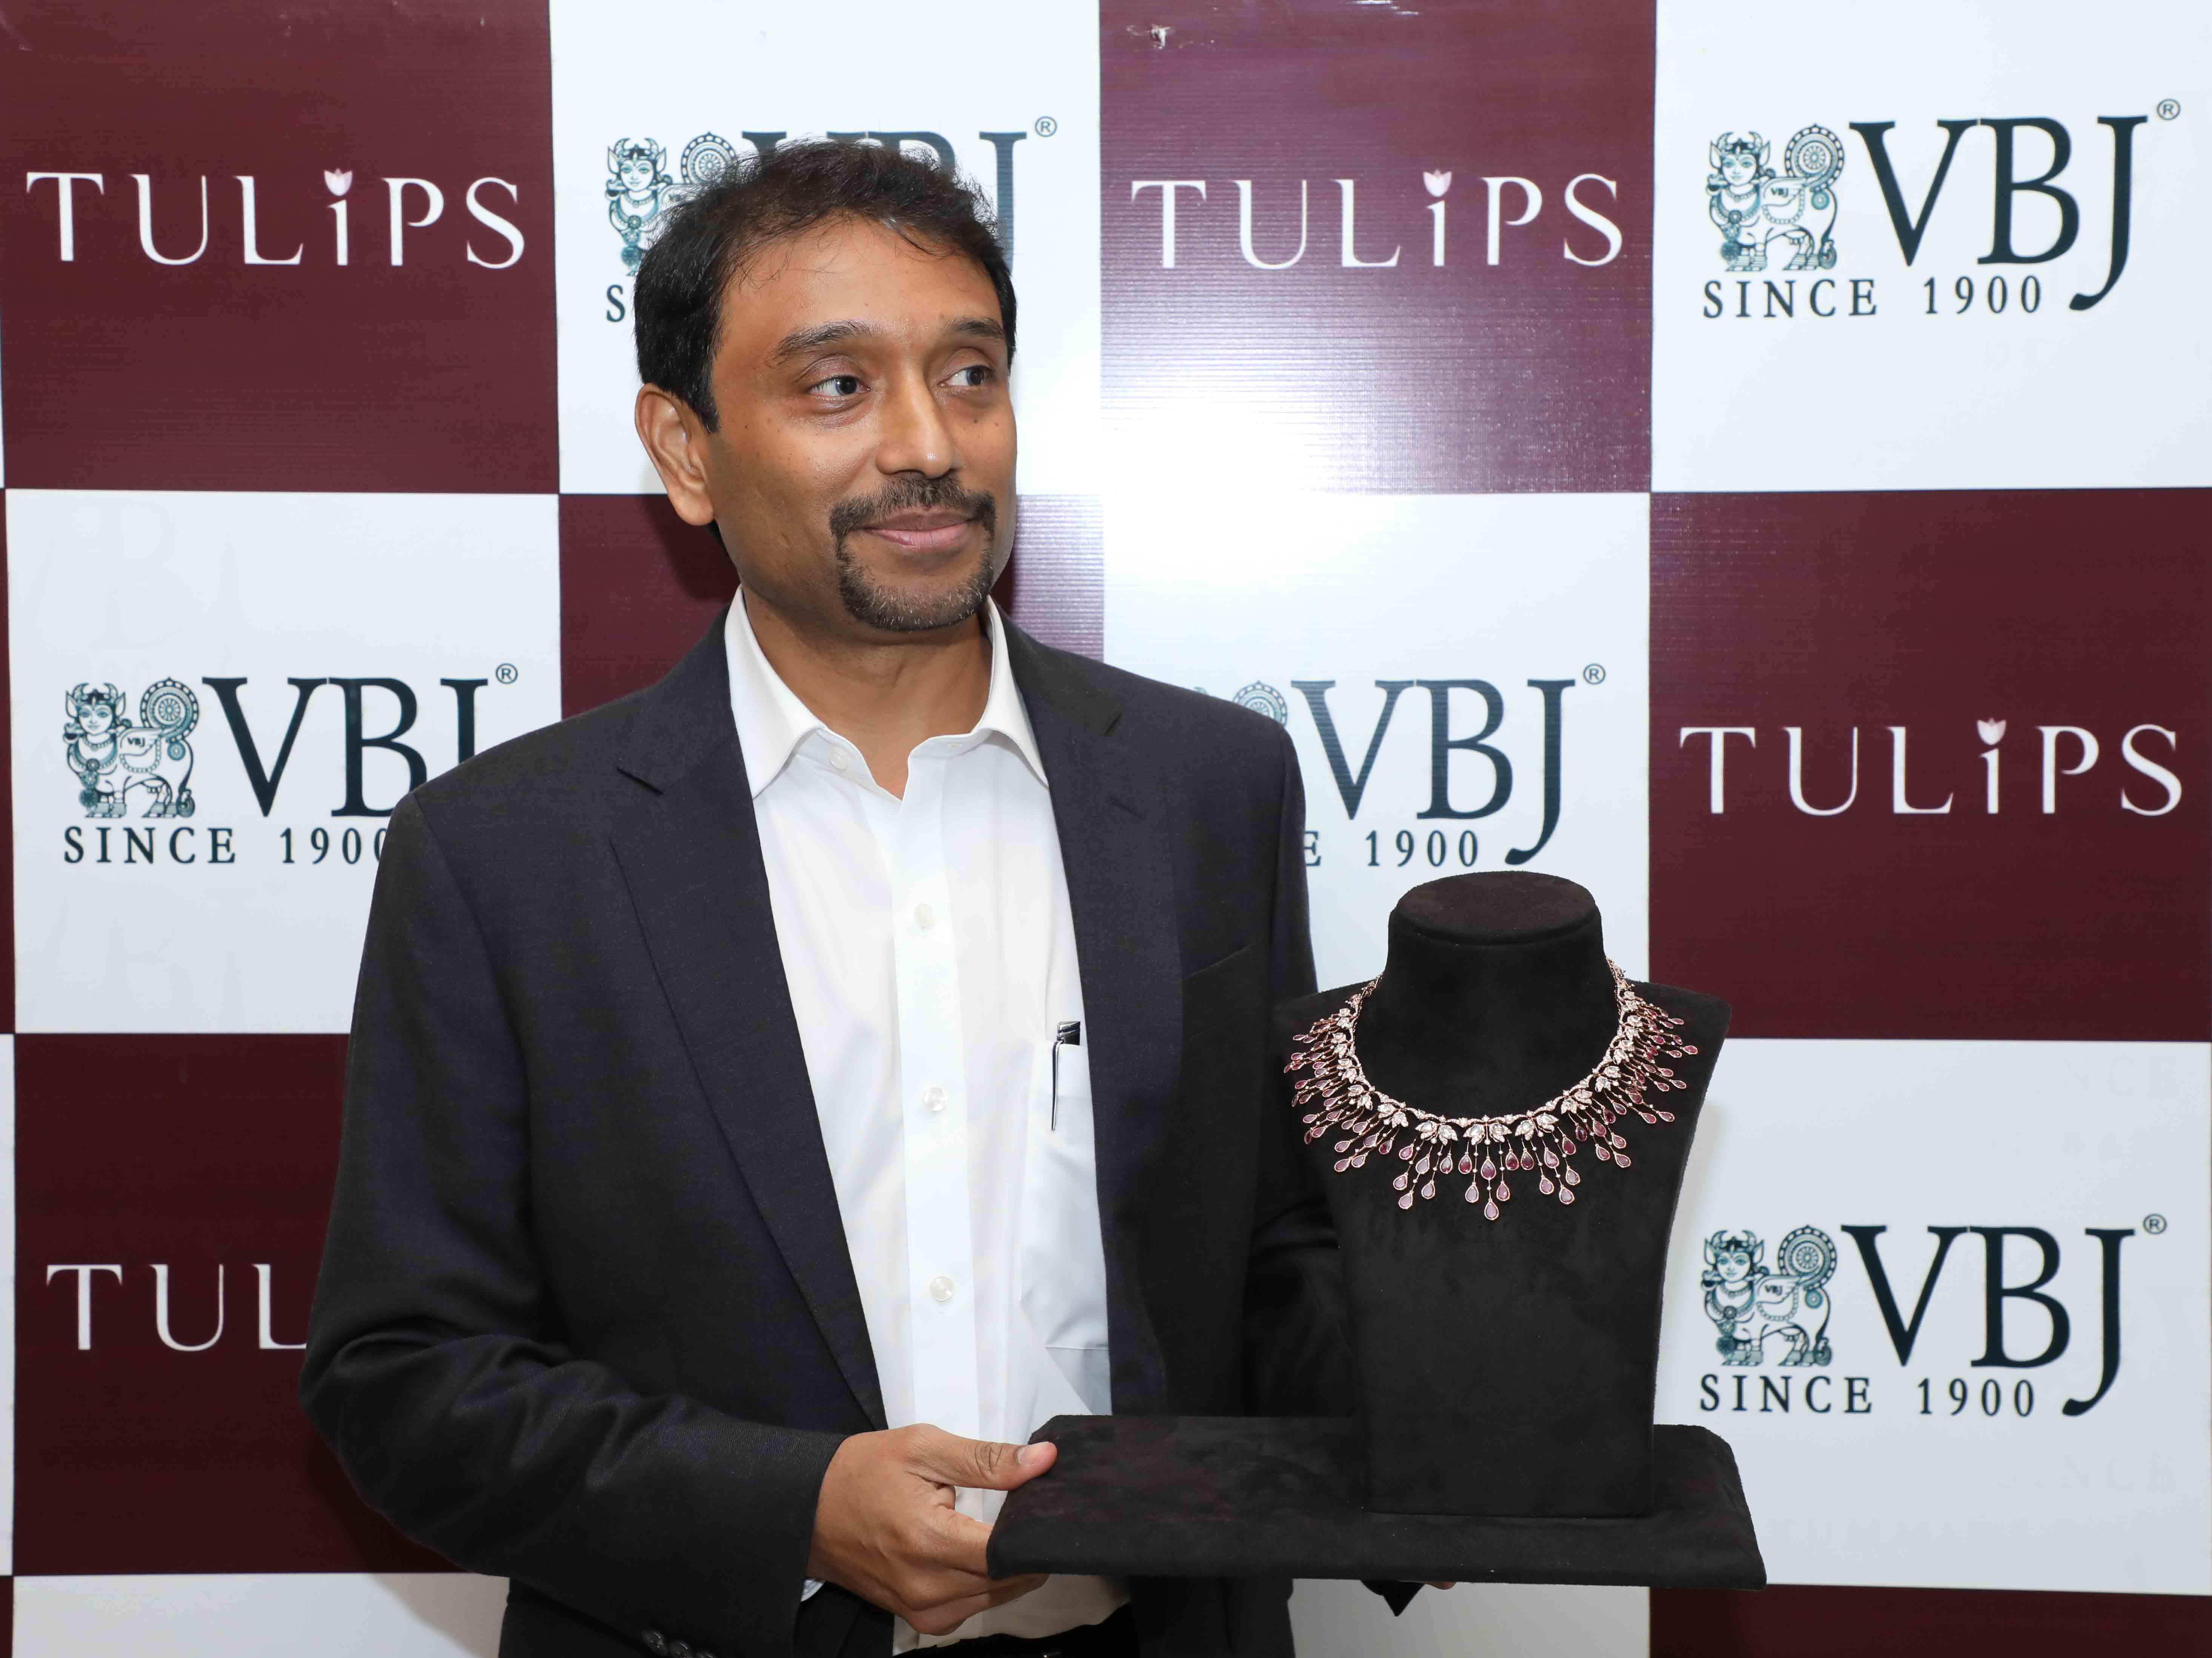 Mr. Jithendra Vummidi, Managing Partner at the launch of Tulips collection at the Anna Nagar showroom